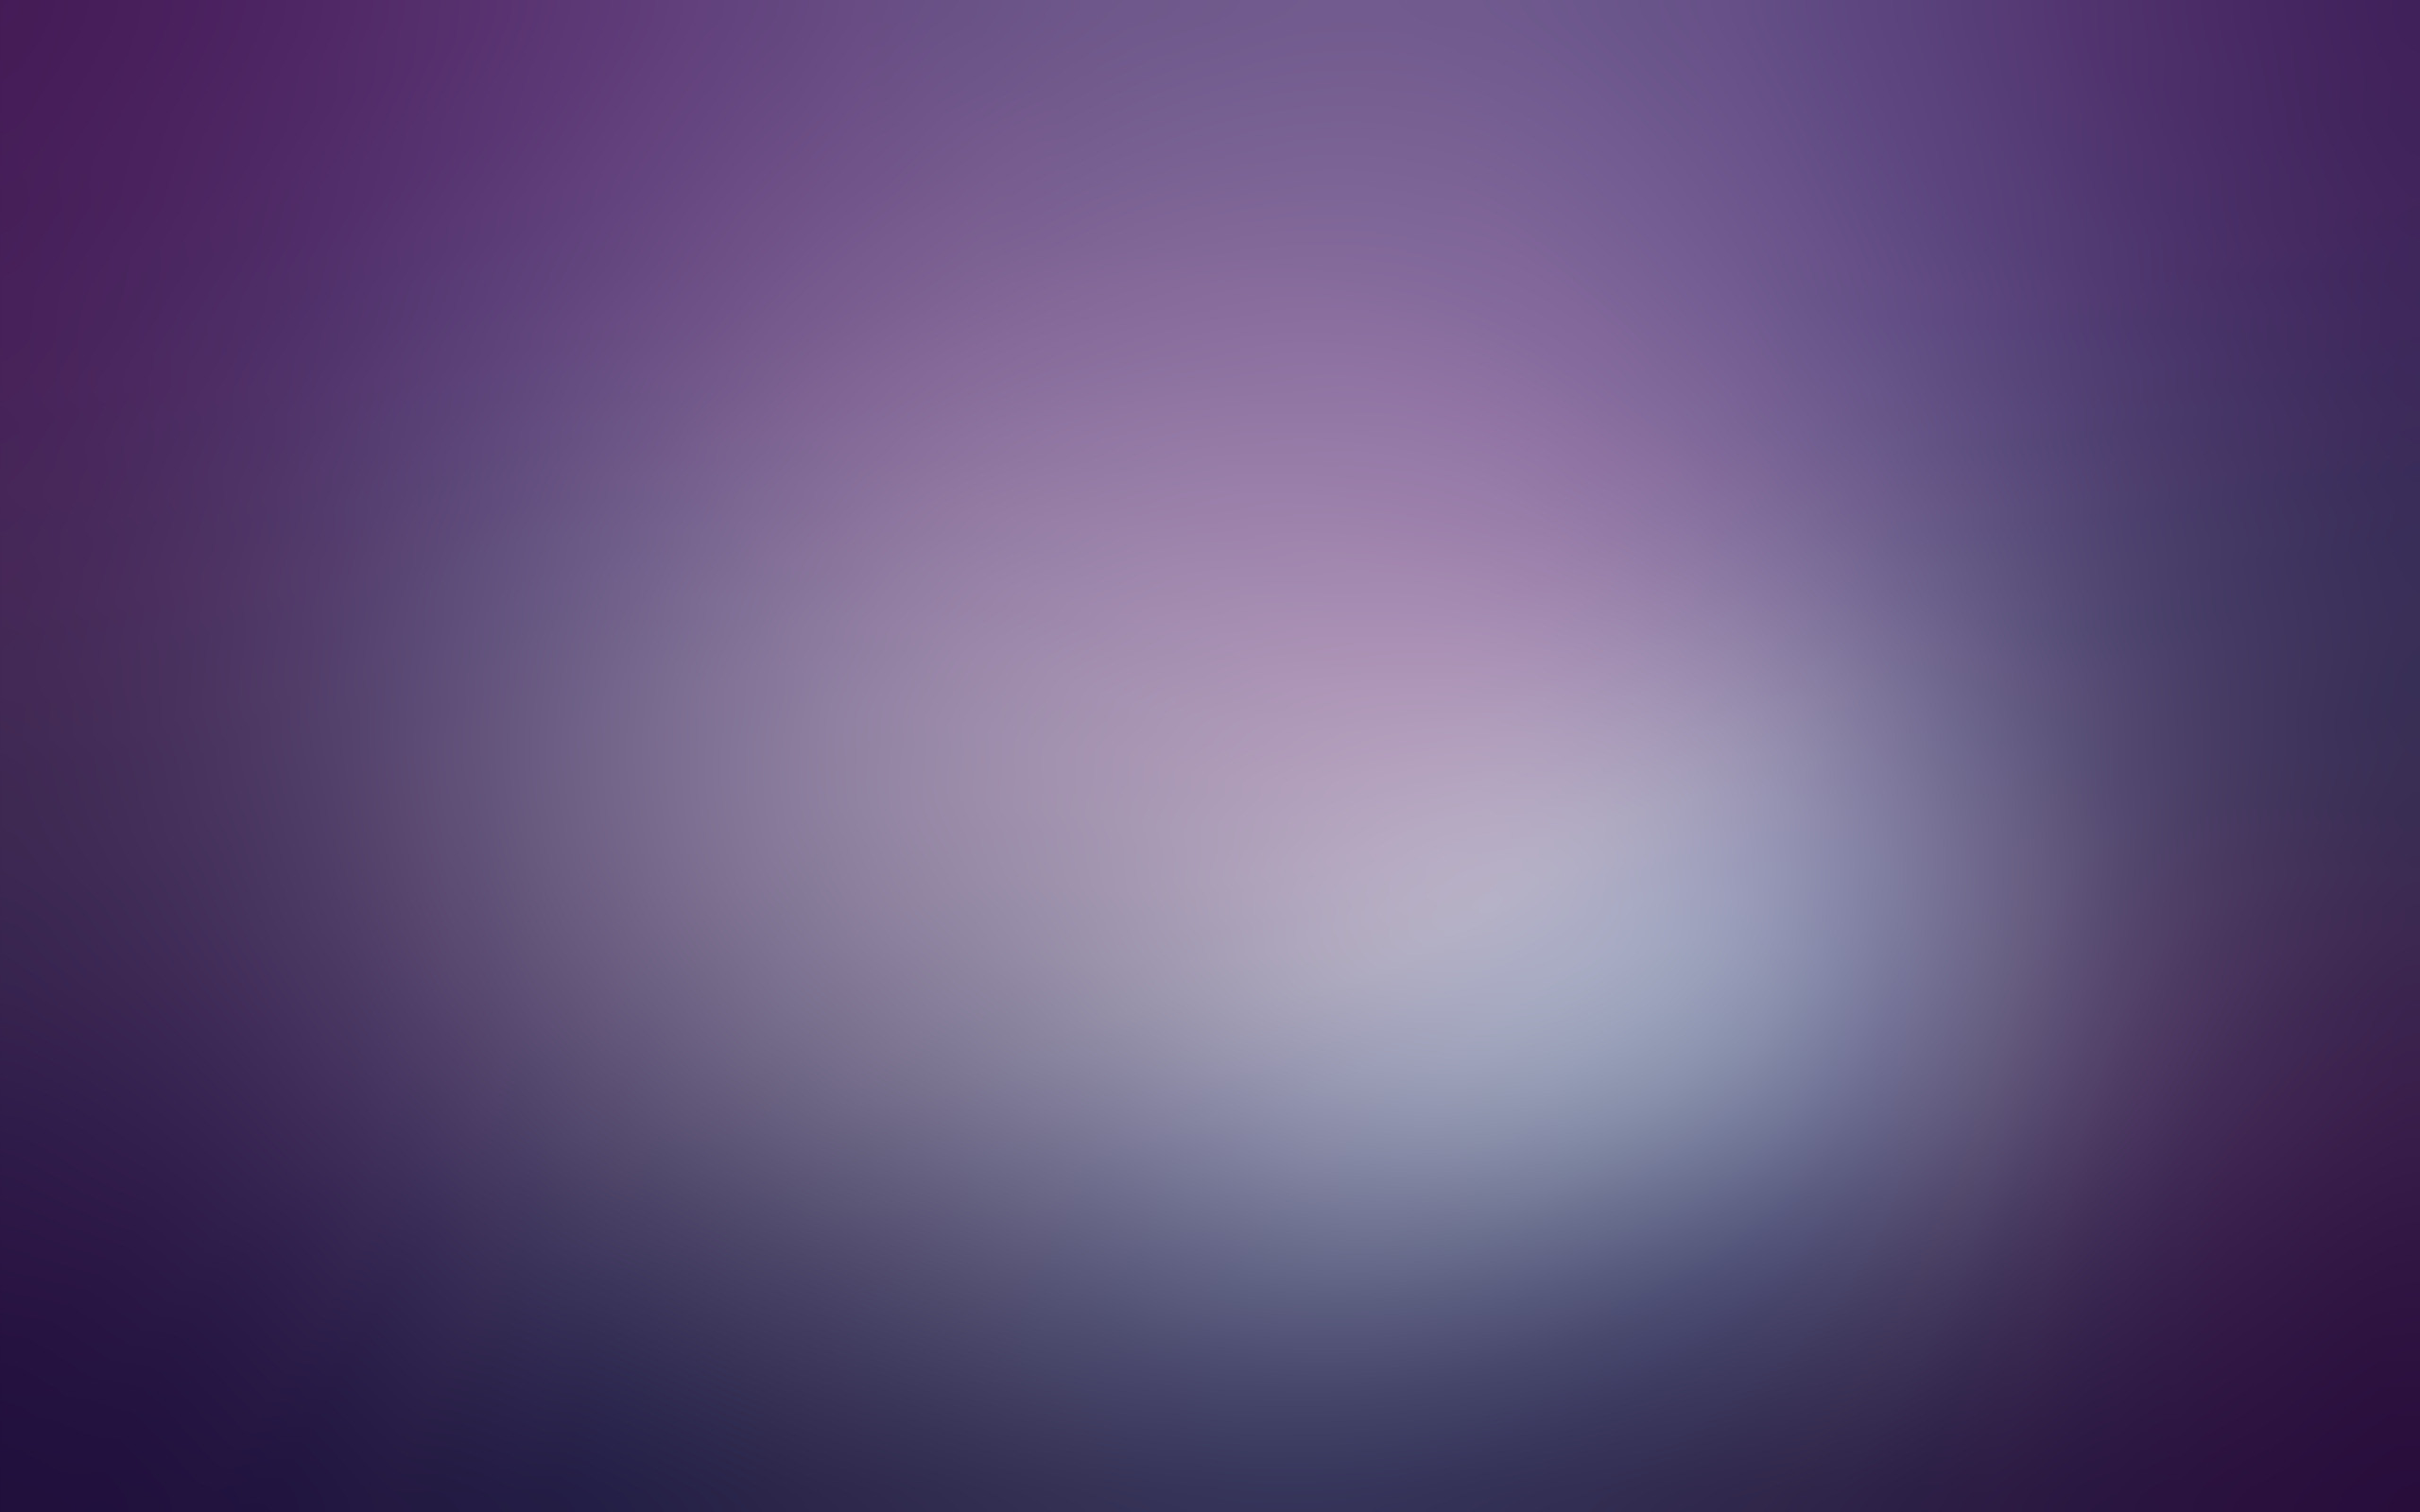 Purple Silver And Black Wallpaper 4 Hd Wallpaper. Purple Silver And Black  Wallpaper 4 Hd Wallpaper